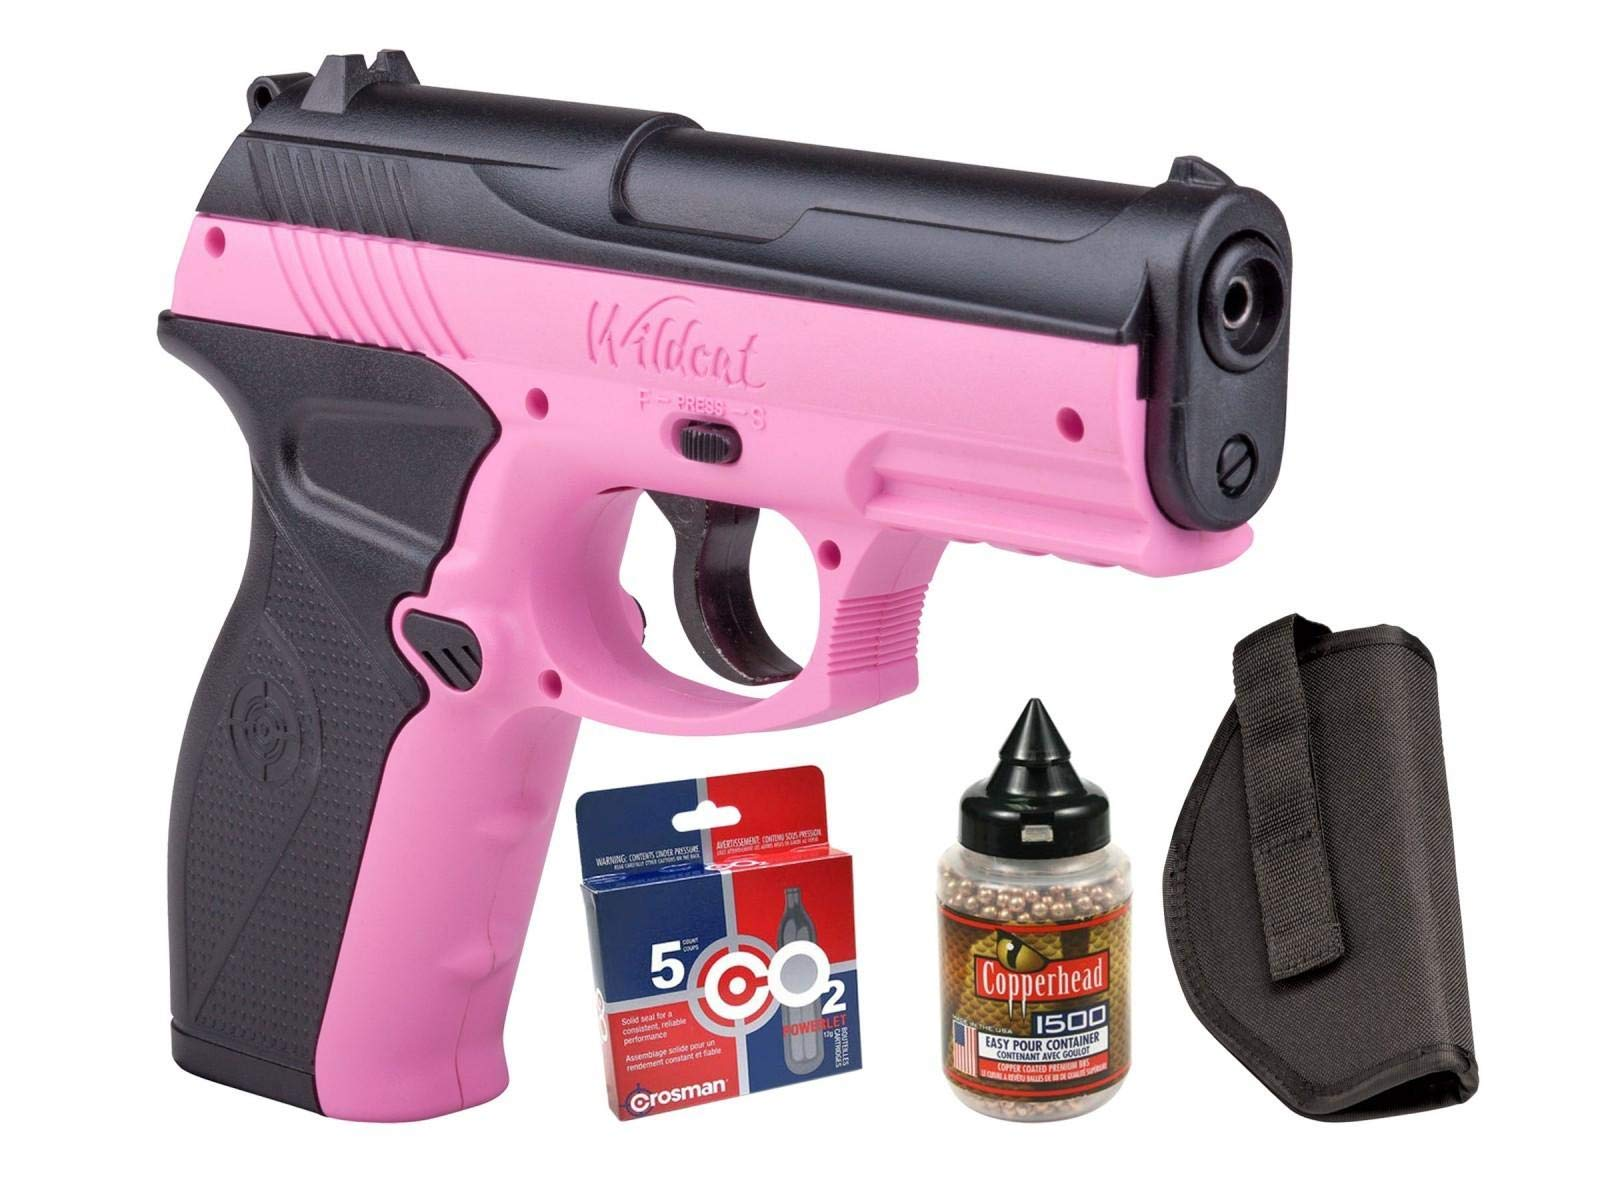 Crosman Wildcat CO2 Pistol BB Kit air pistol by Crosman